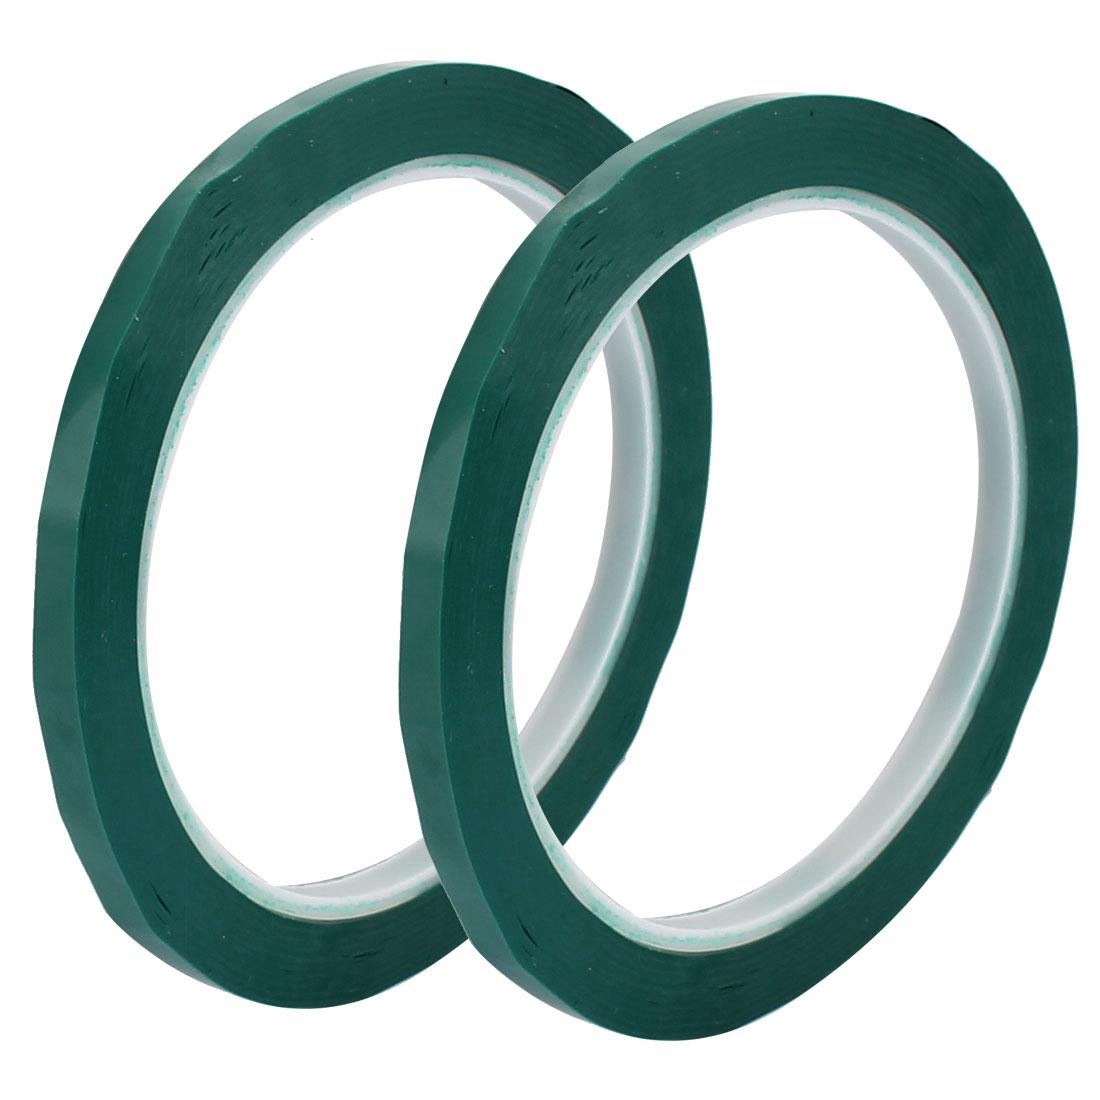 2 Pcs 5mm Single Sided Strong Self Adhesive Mylar Tape 50M Length Logo Green